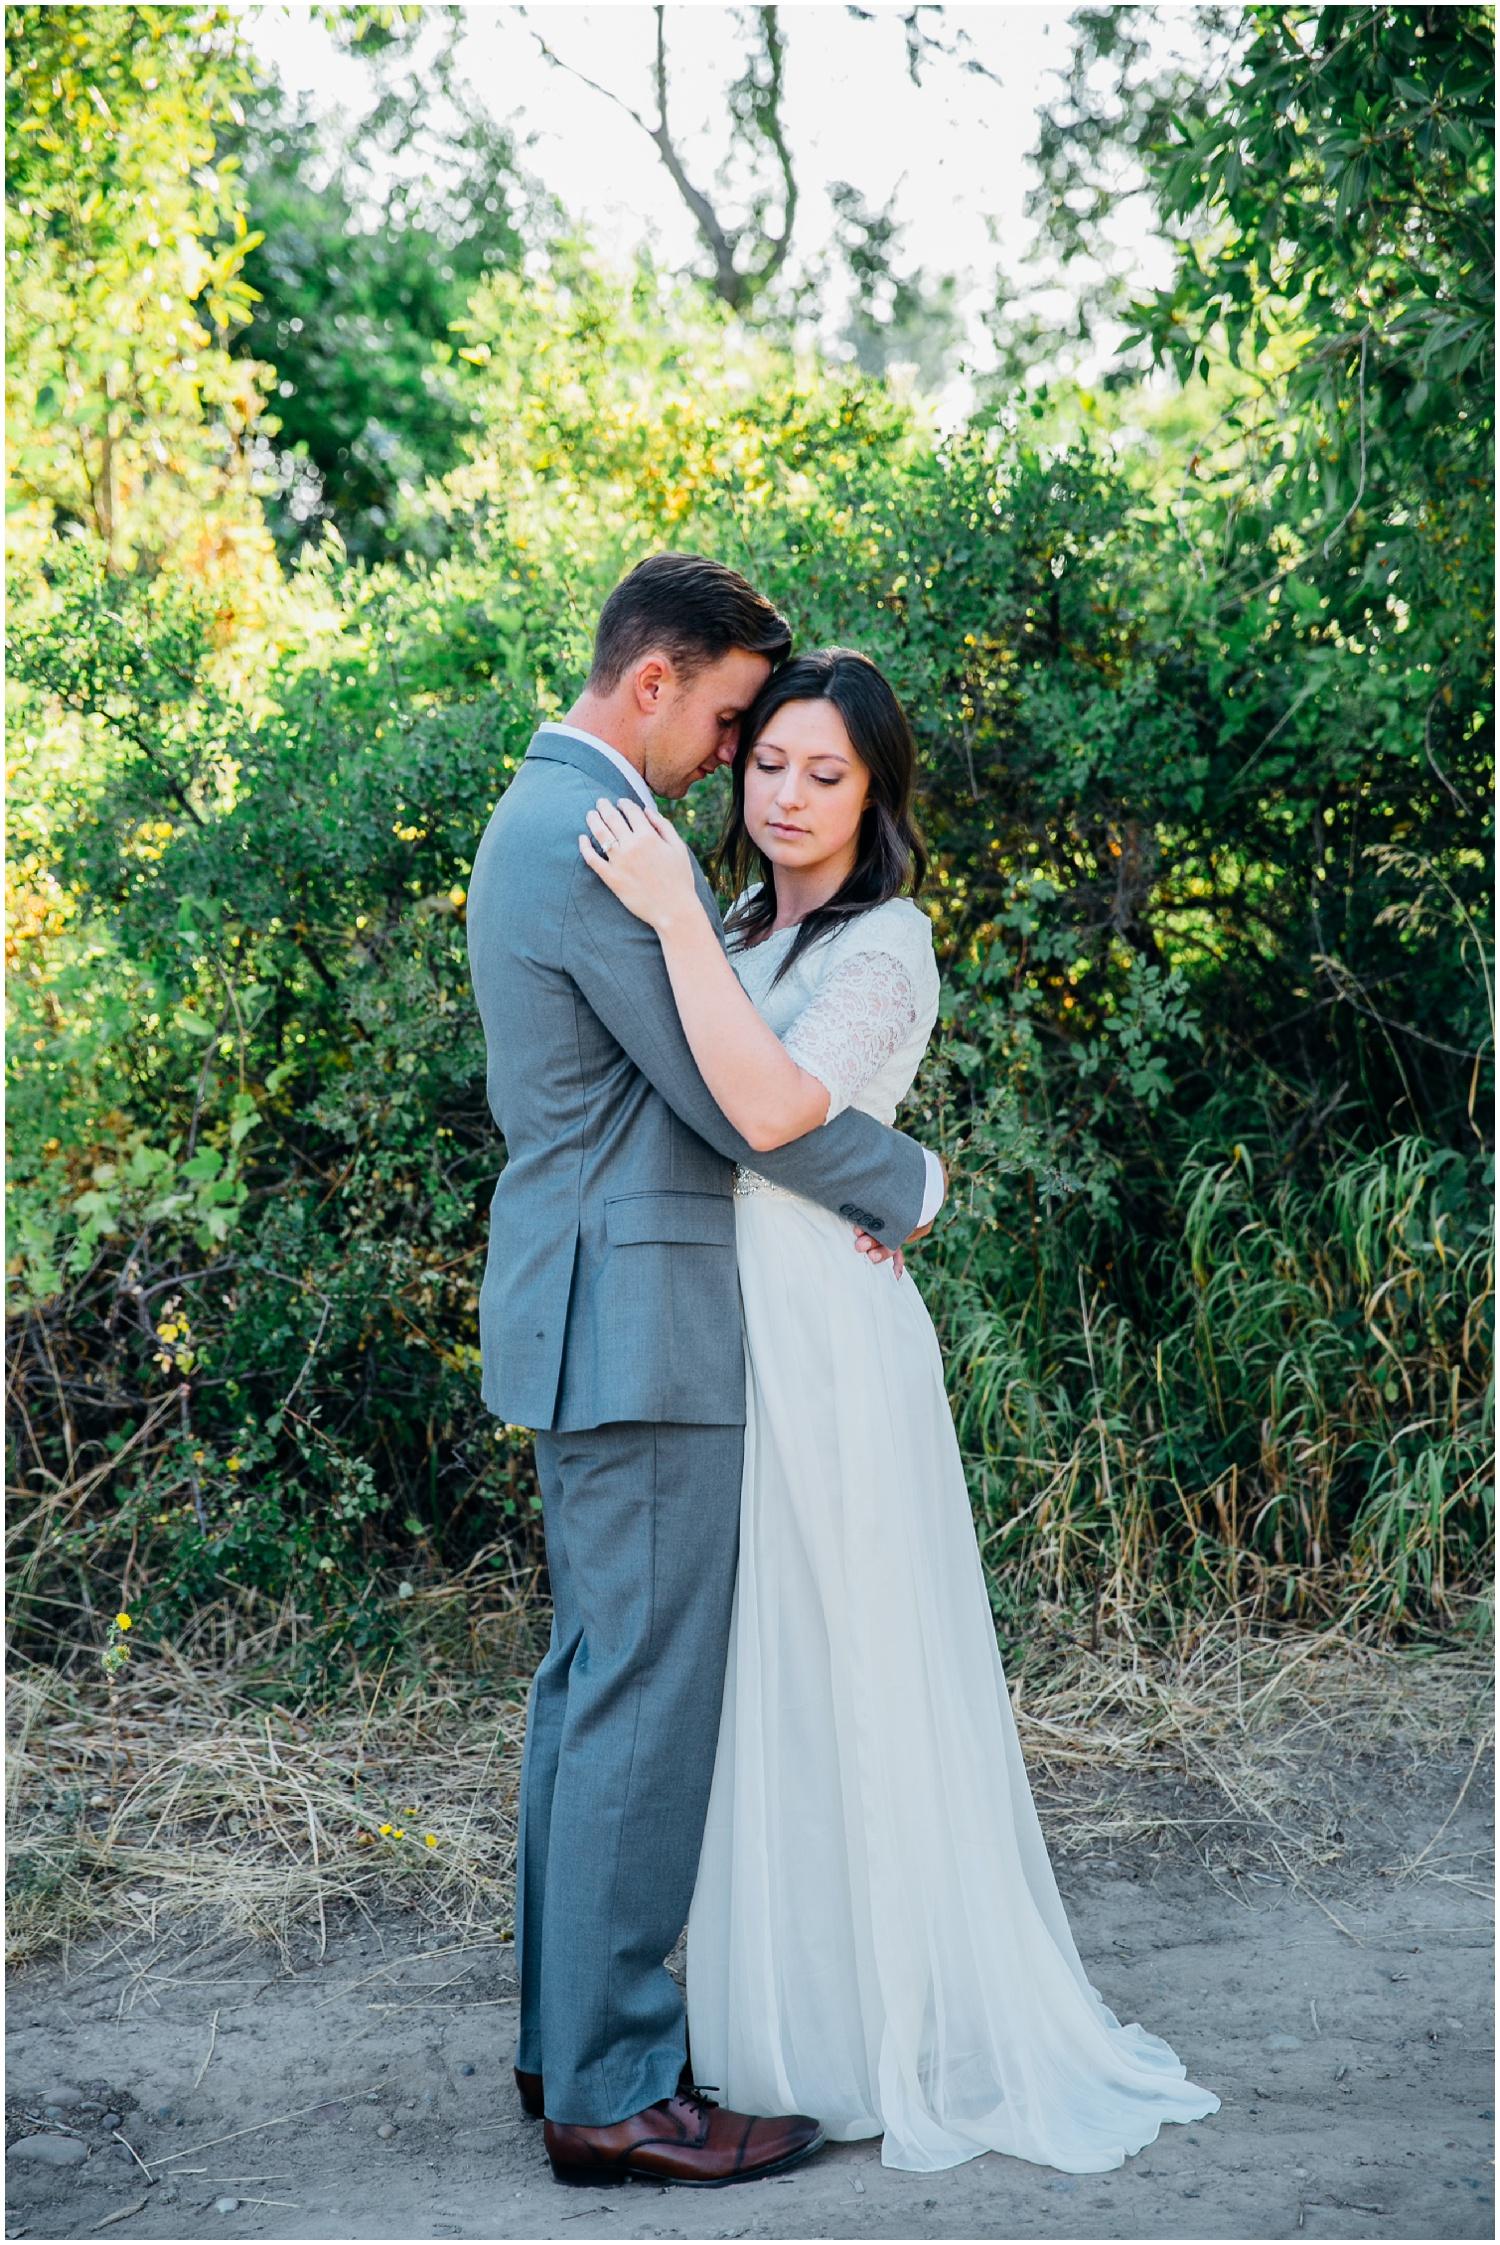 kelly-canyon-idaho-falls-temple-bridals-idaho-colorado-wyoming-wedding-photographer_0816.jpg